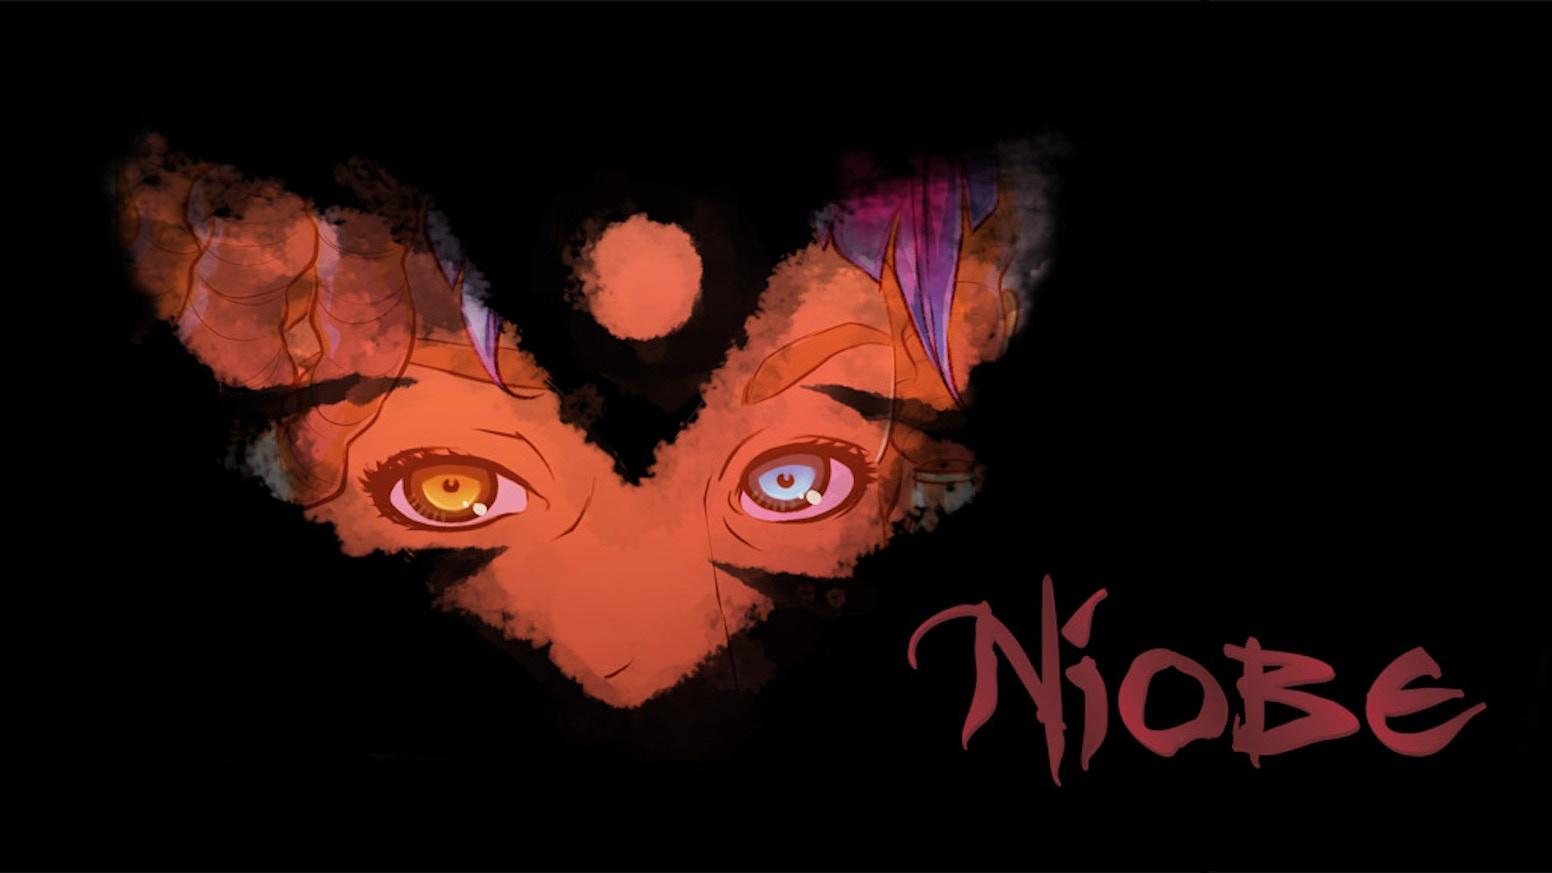 """With a world divided, who do you turn to?"" Niobe by Sebastian Jones, Amandla Stenberg, Ashley Woods, Sheldon Mitchell, & Darrell May."